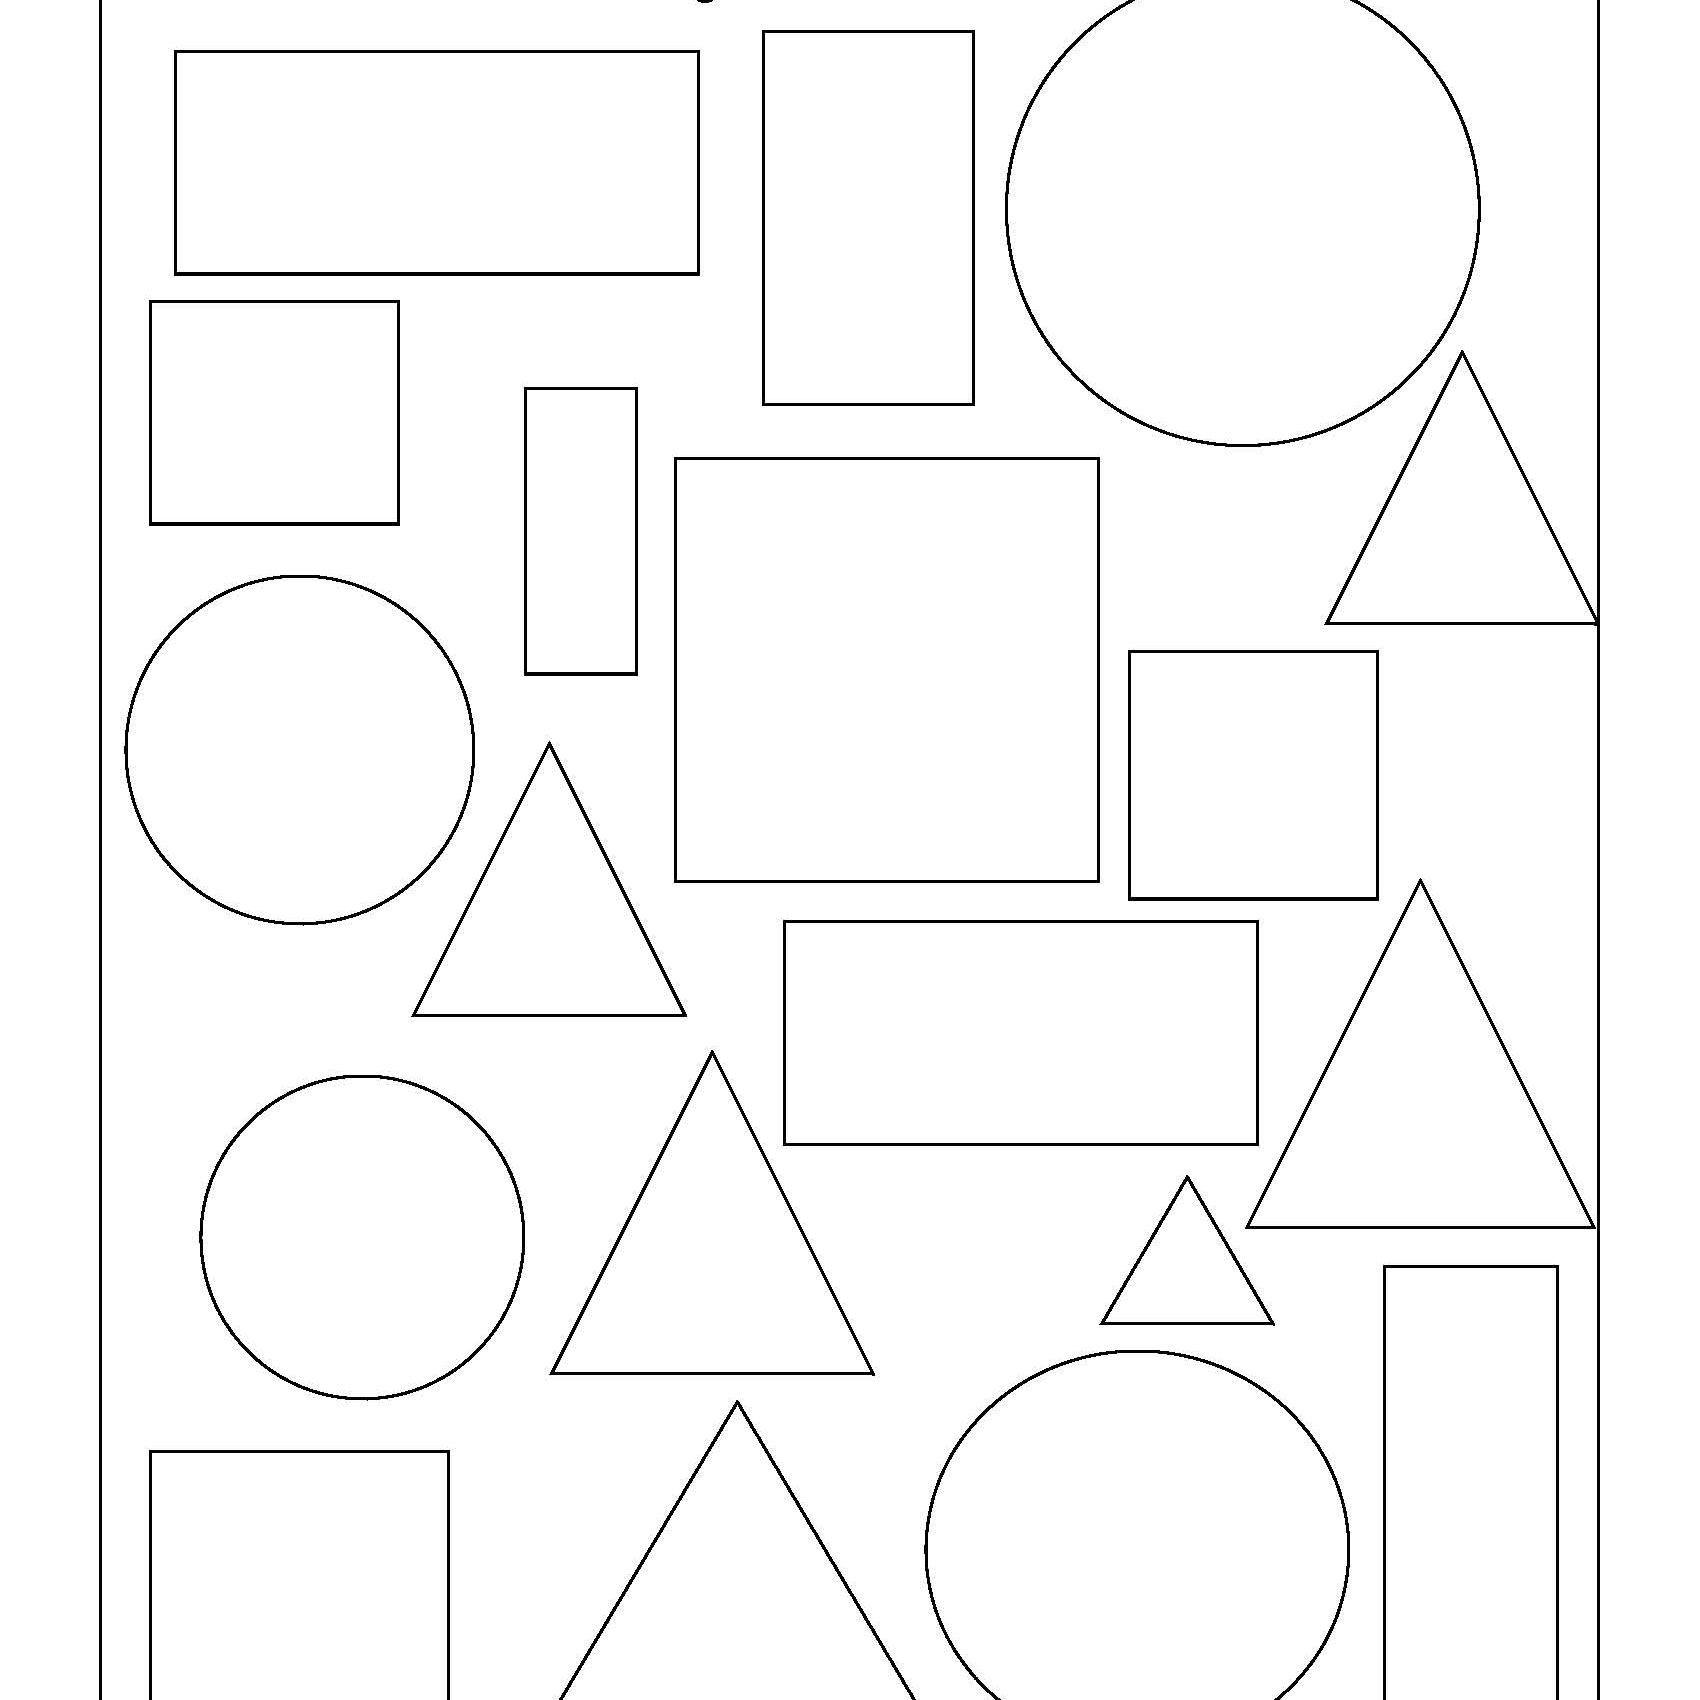 56 Kindergarten Math Worksheets Free Pics